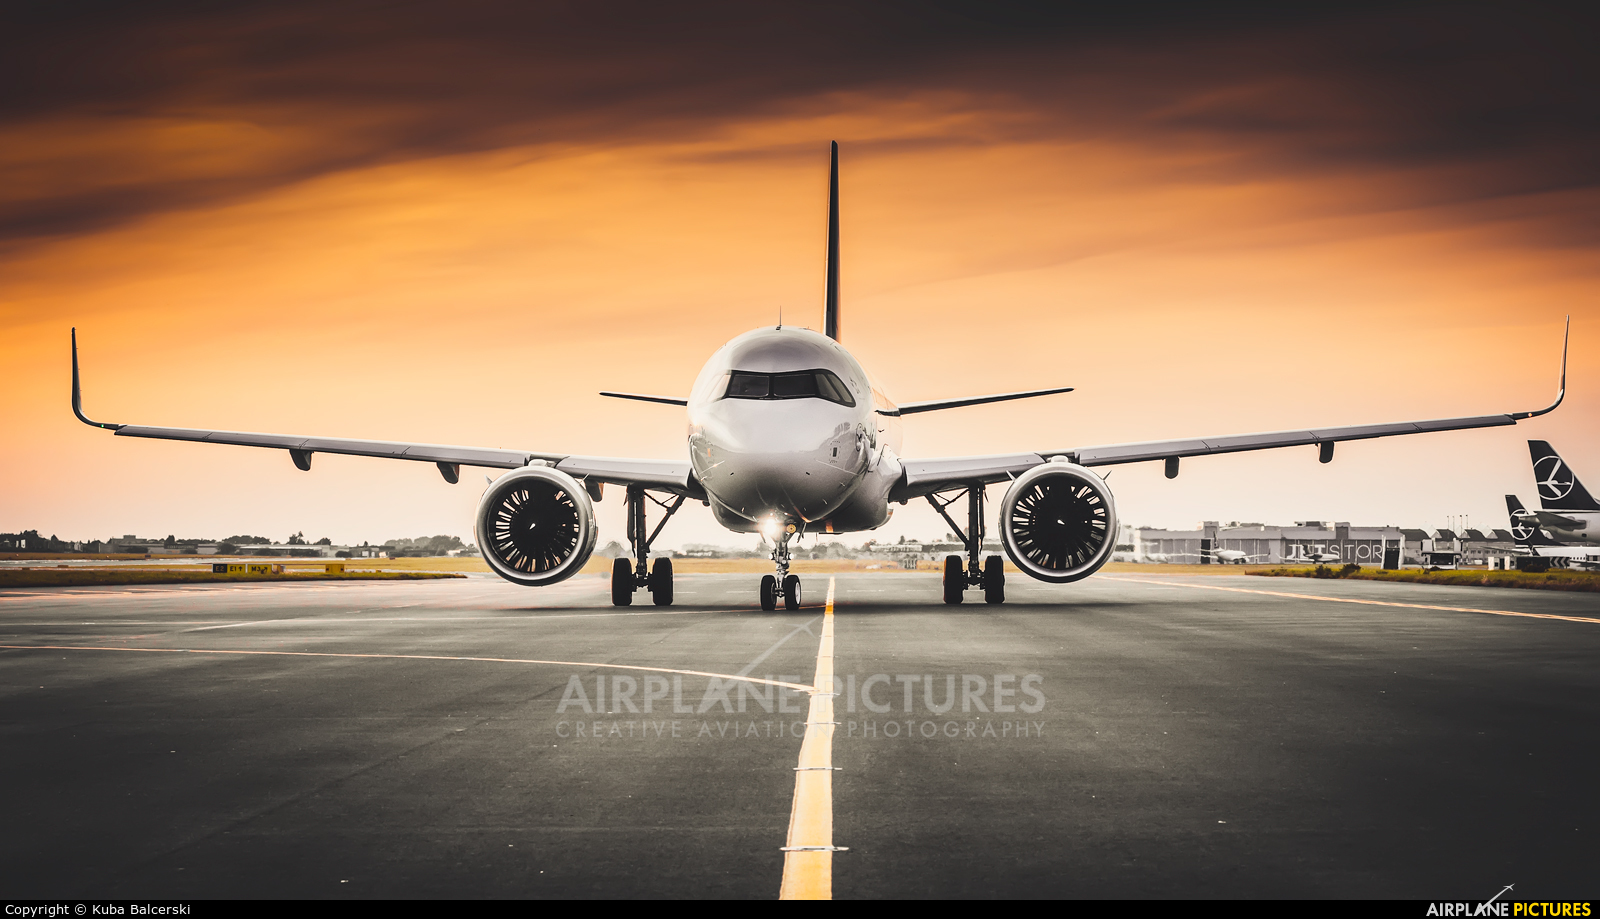 Lufthansa D-AINY aircraft at Warsaw - Frederic Chopin